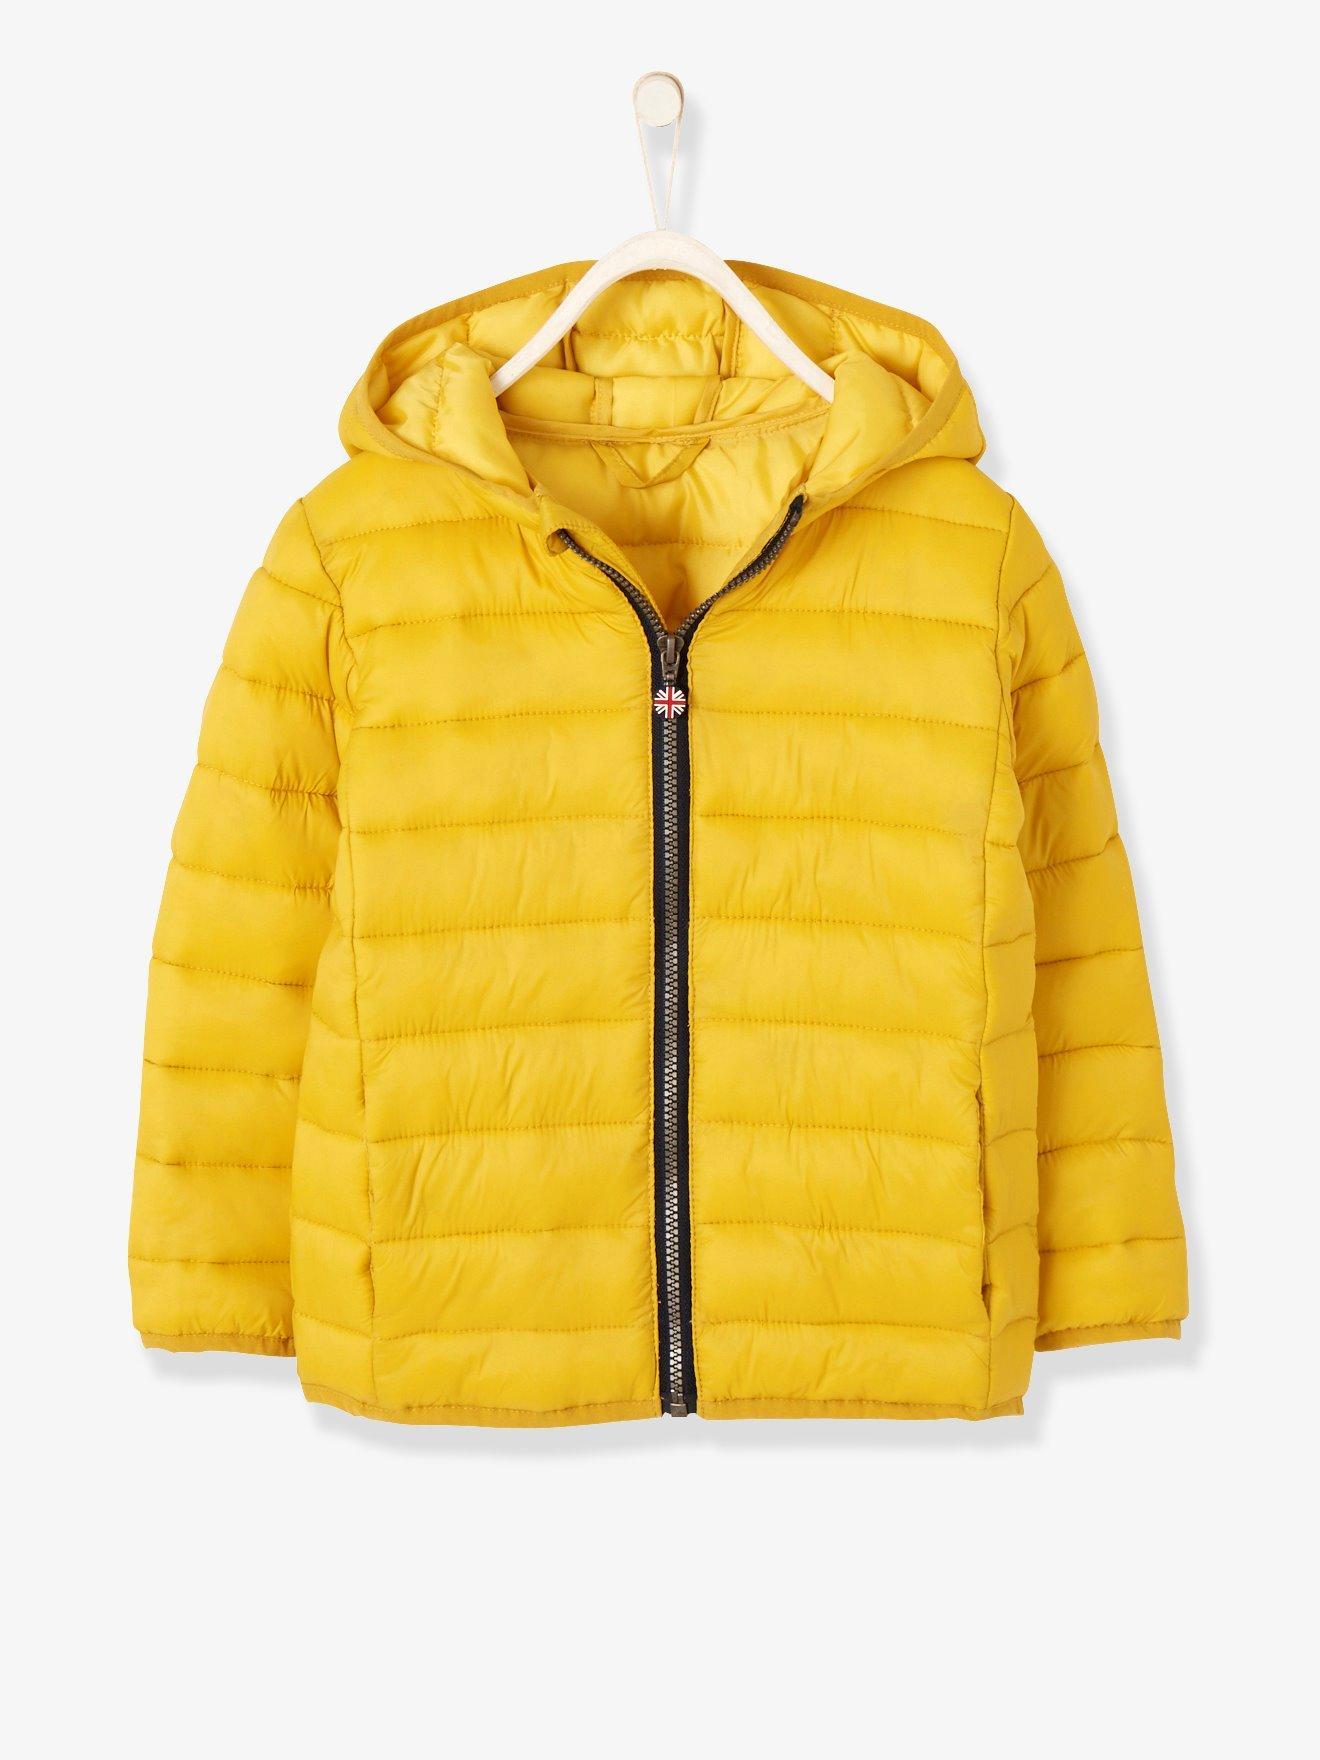 1f02908438b Chaqueta acolchada ligera para niño, con capucha amarillo oscuro liso